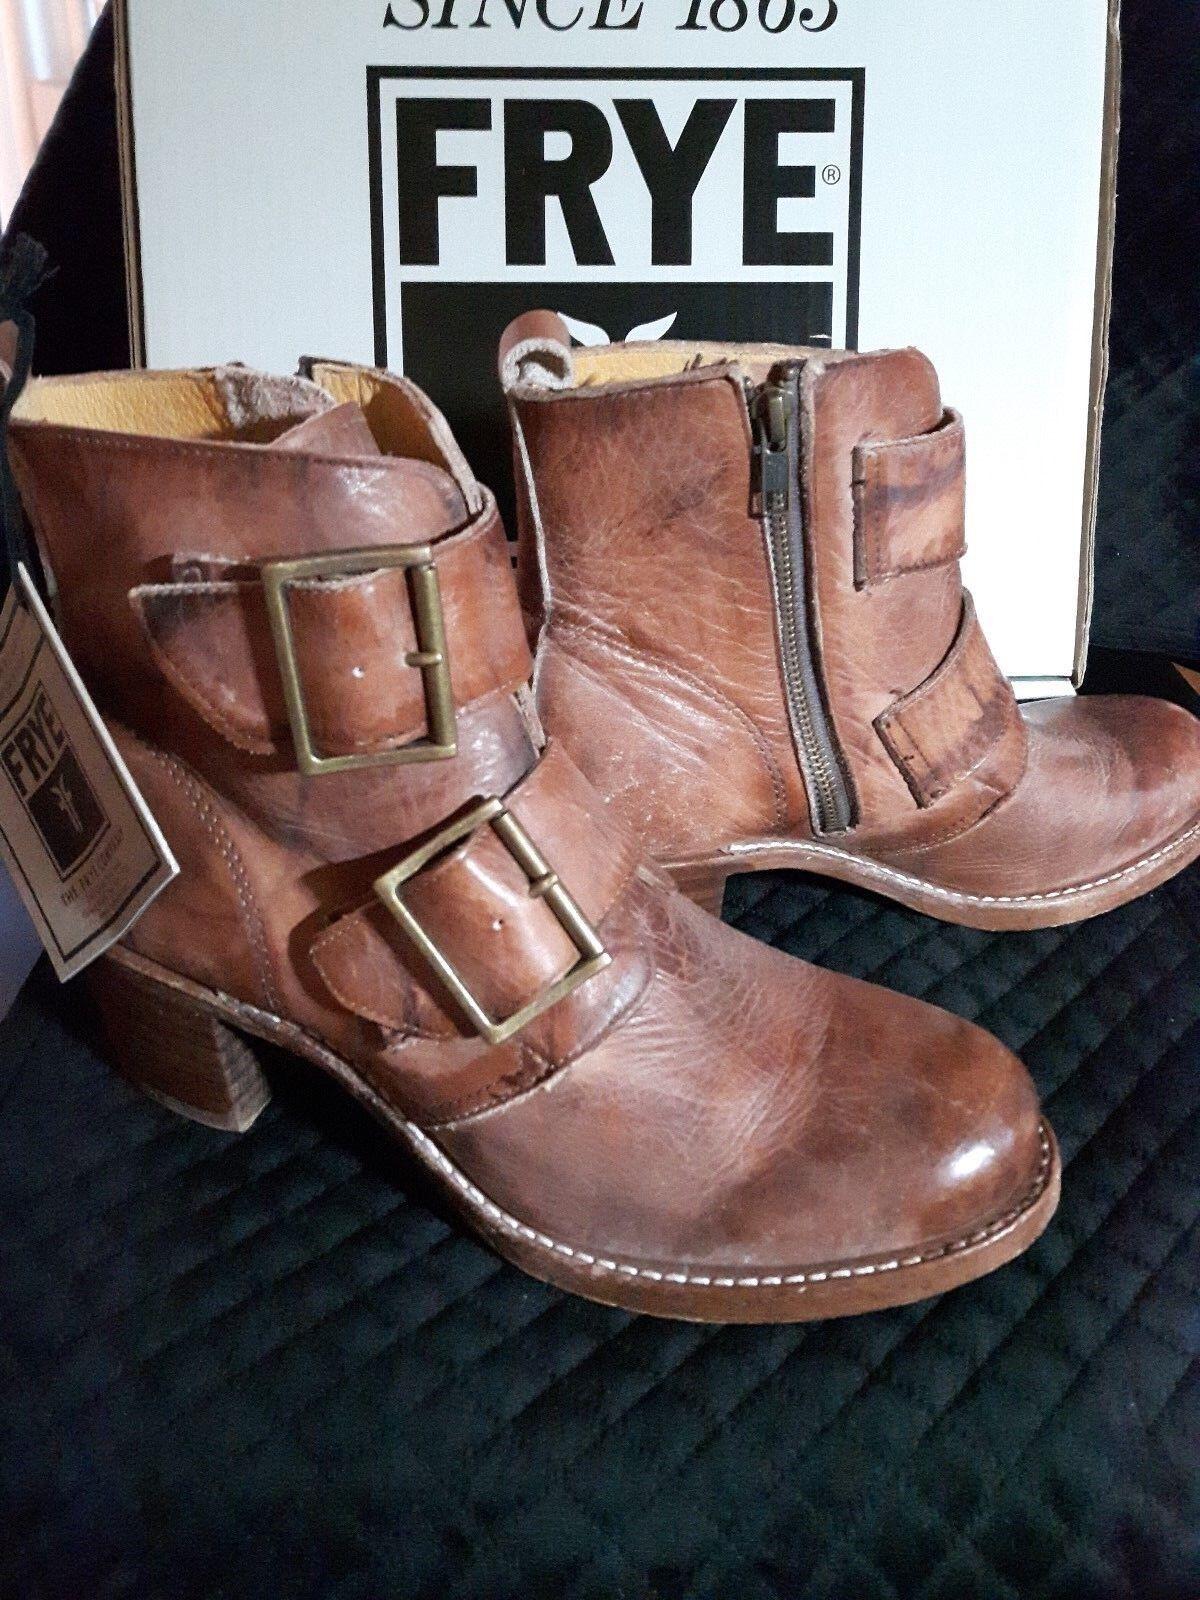 FRYE - SABRINA Double Buckle Boot - Women's Size 10B